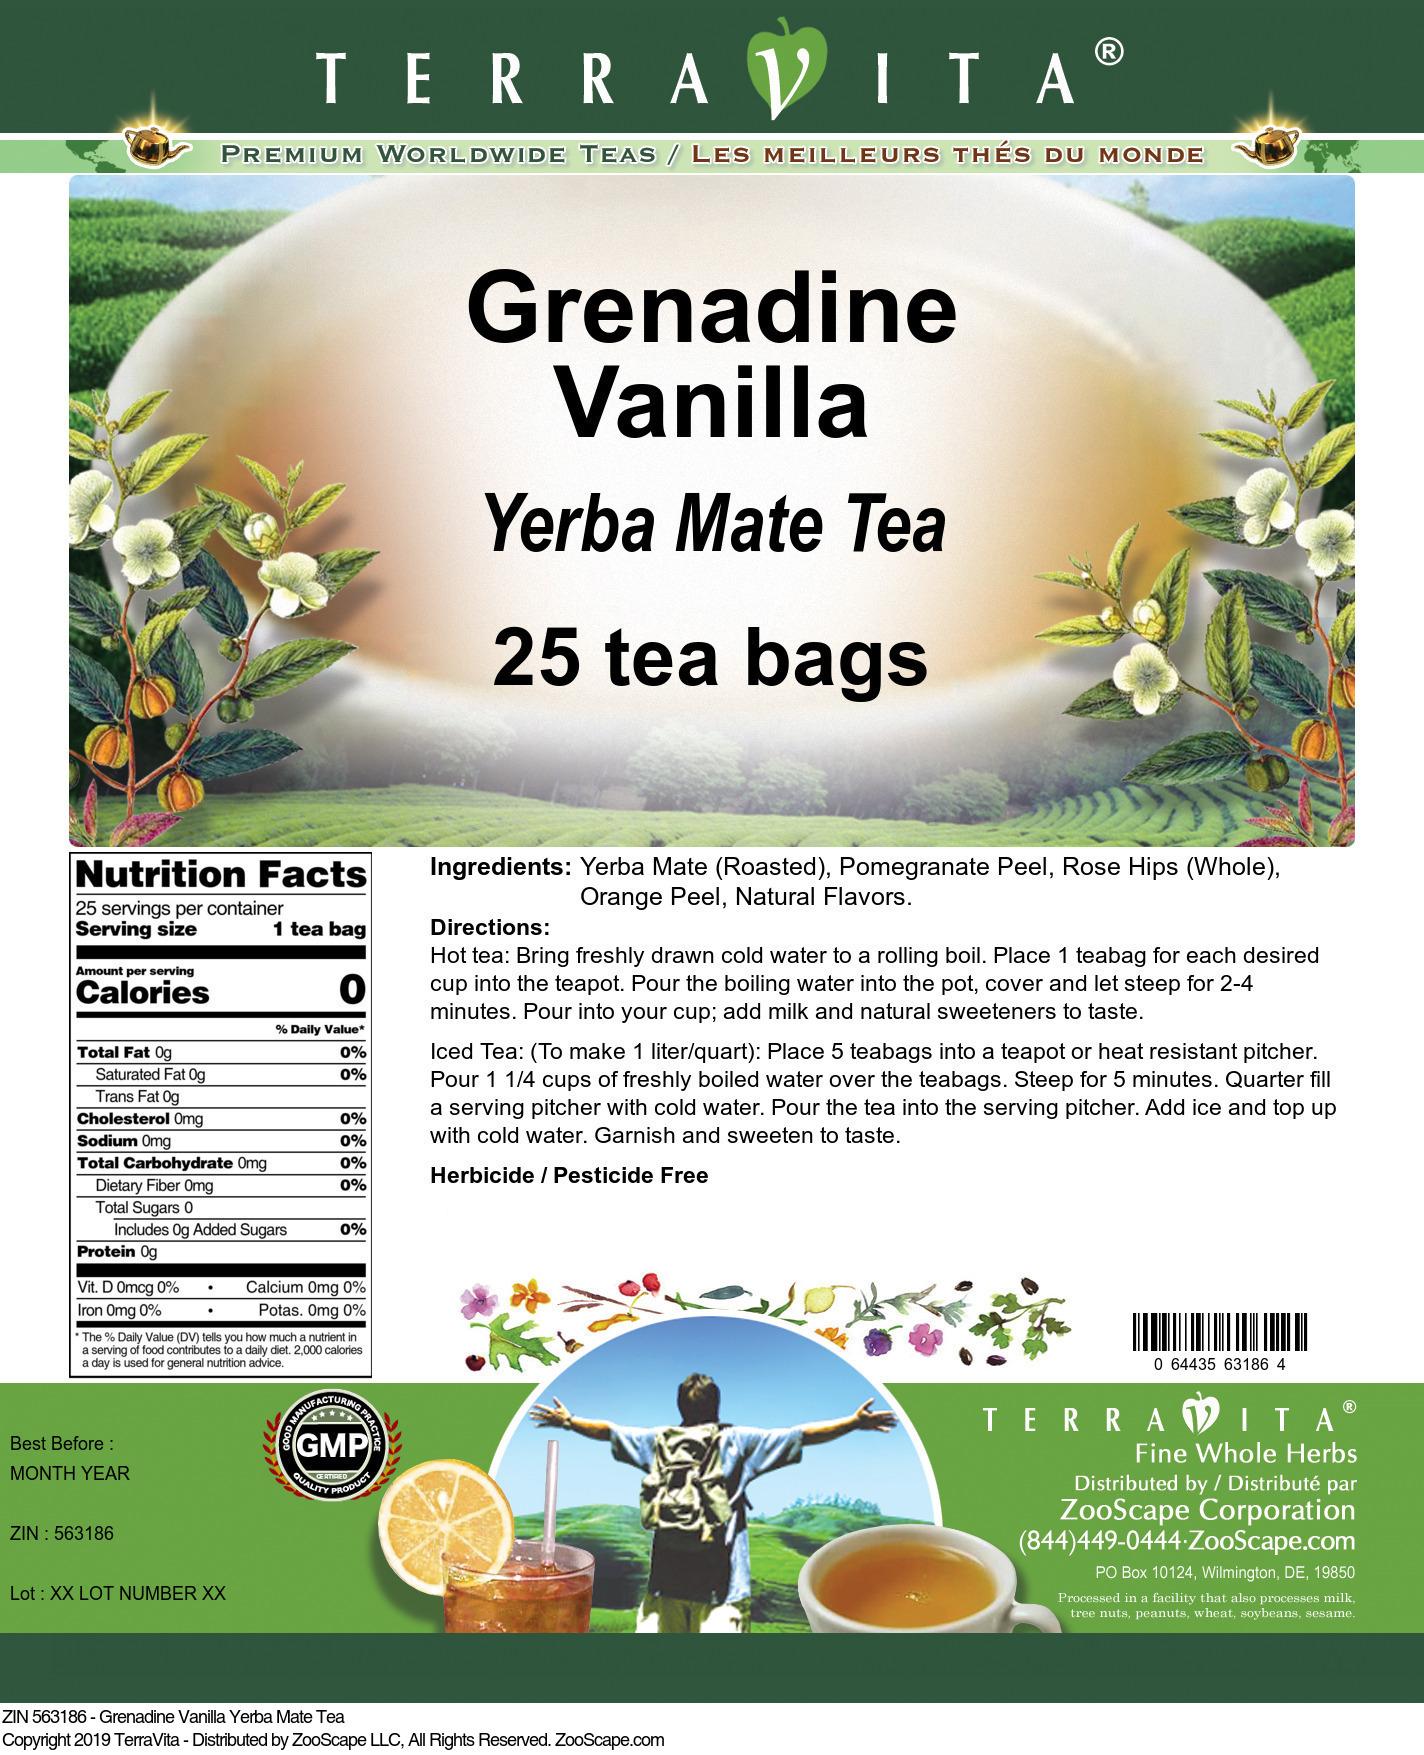 Grenadine Vanilla Yerba Mate Tea